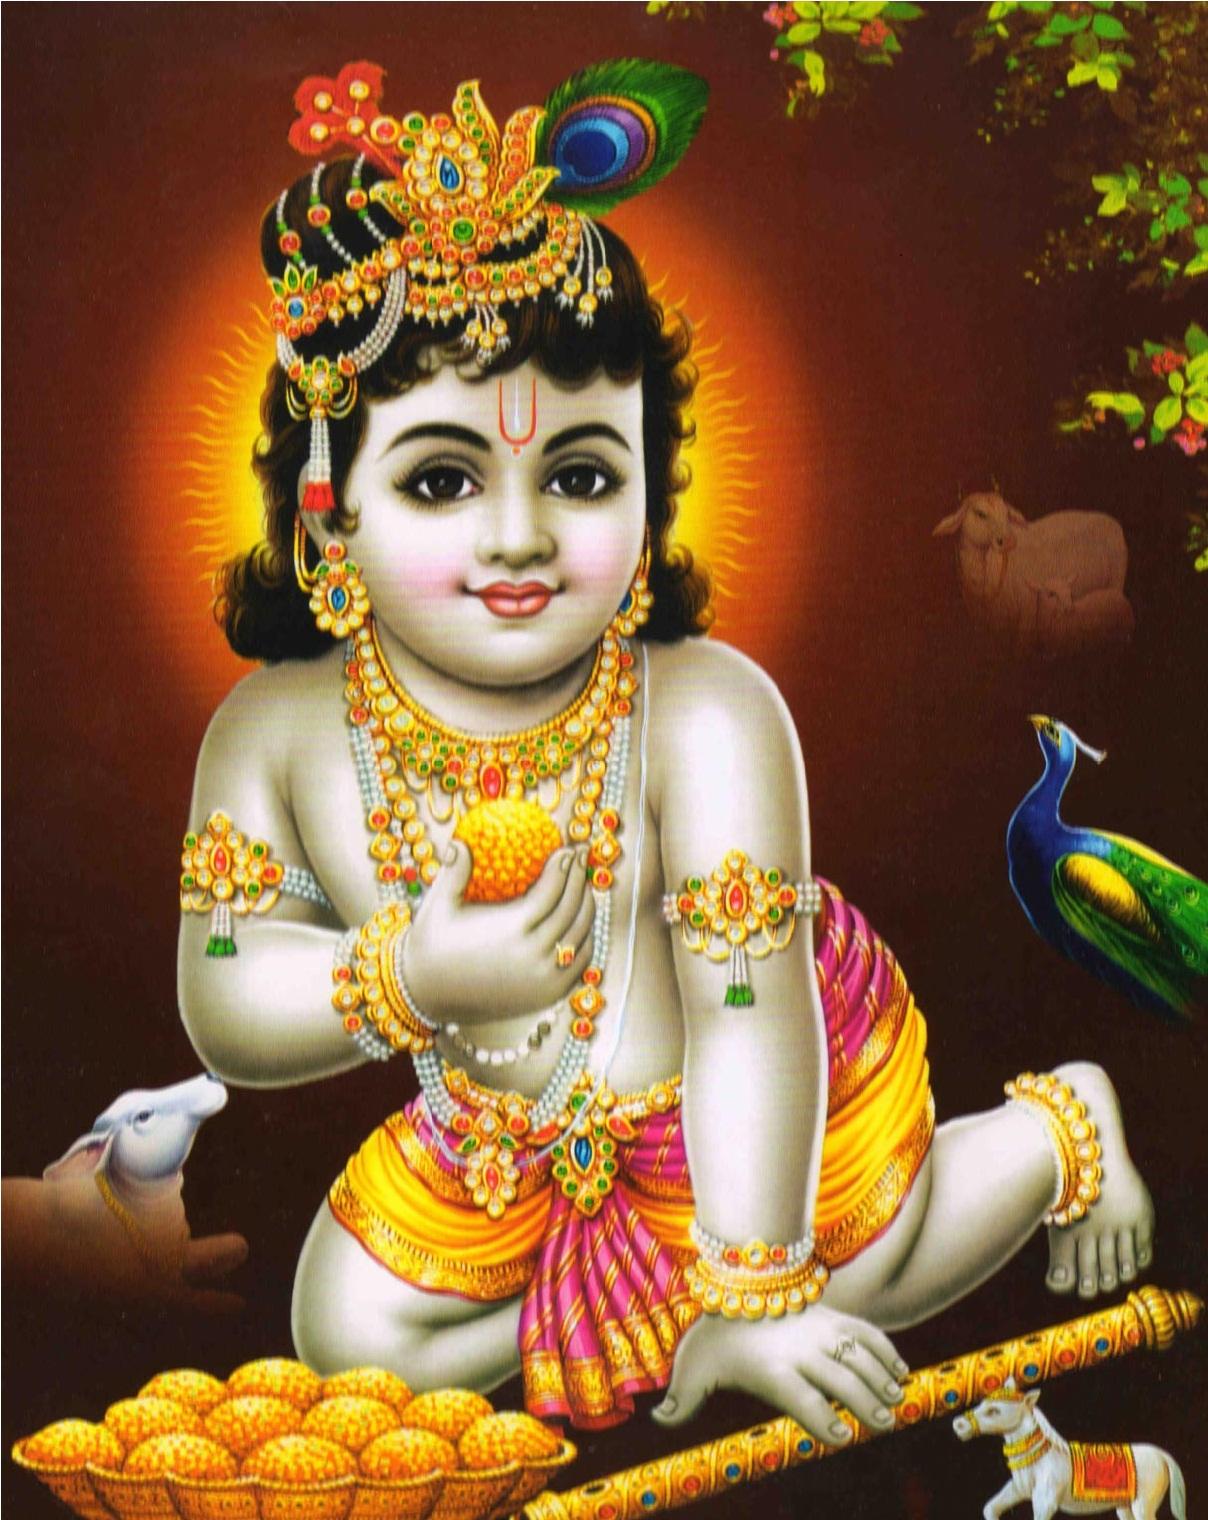 Best Radha Krishna Hd Wallpaper Hindu God Wallpapers For Mobile Phones God Images Amp Hd Photos